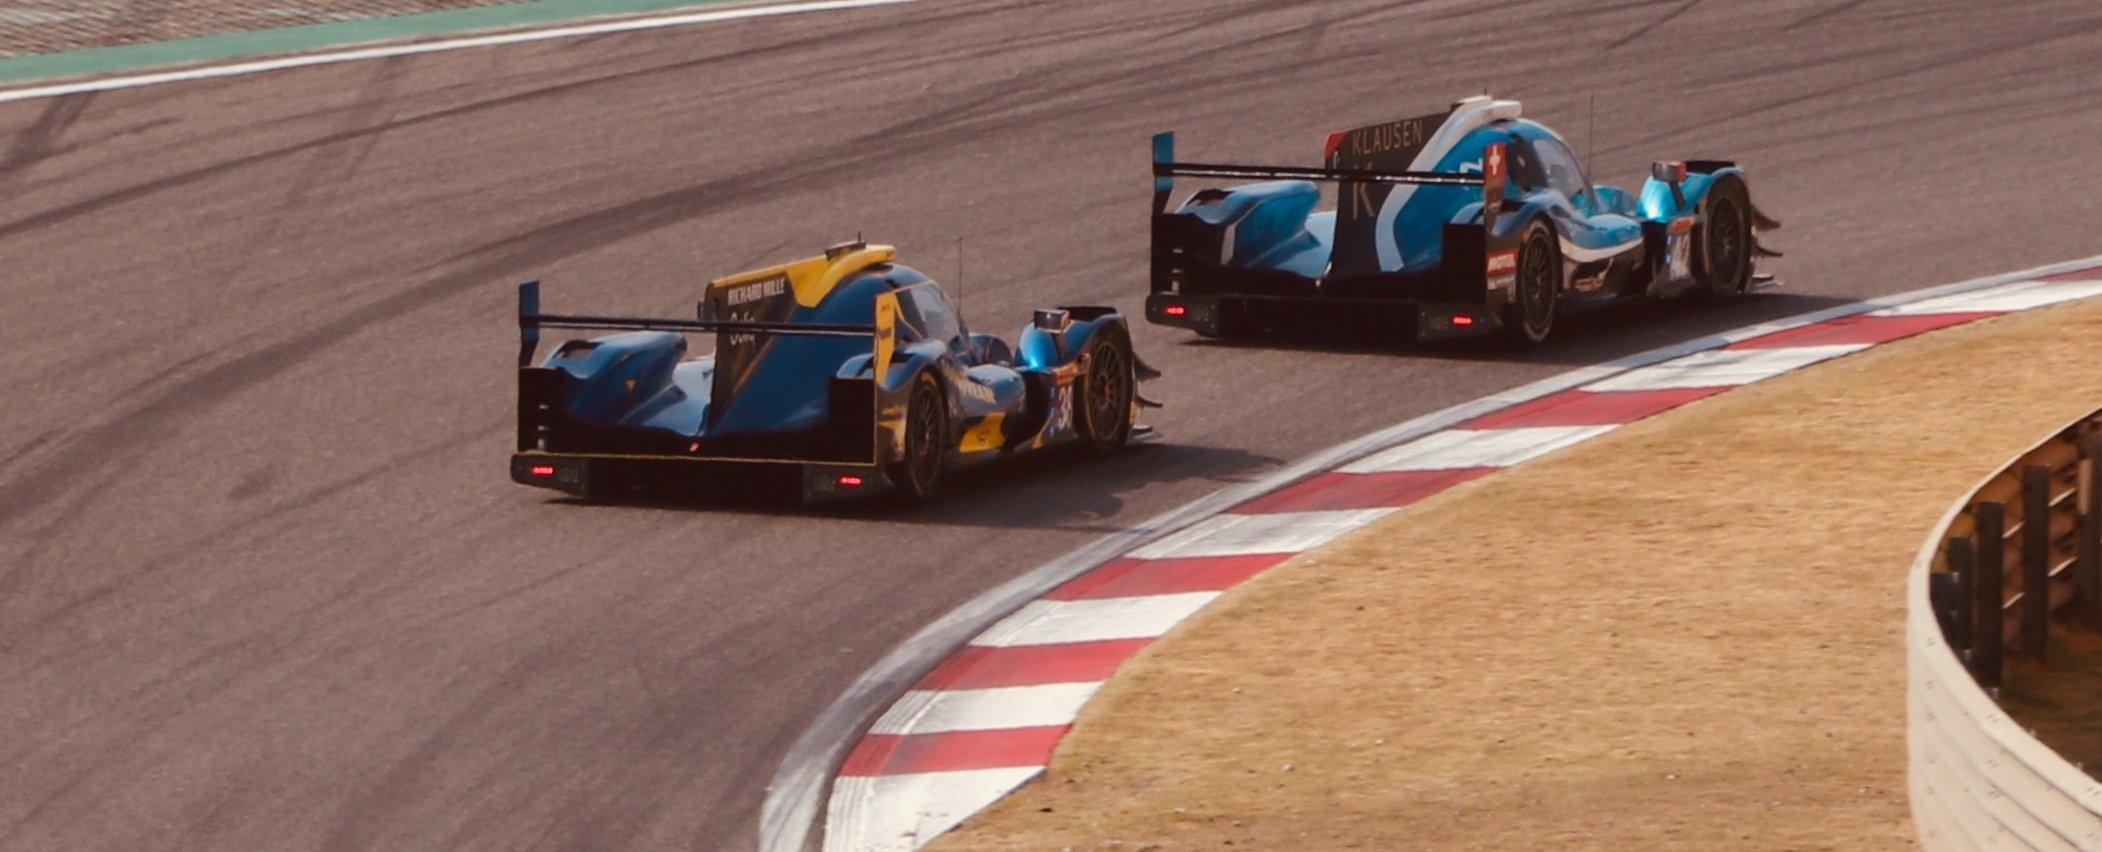 F1 race 3